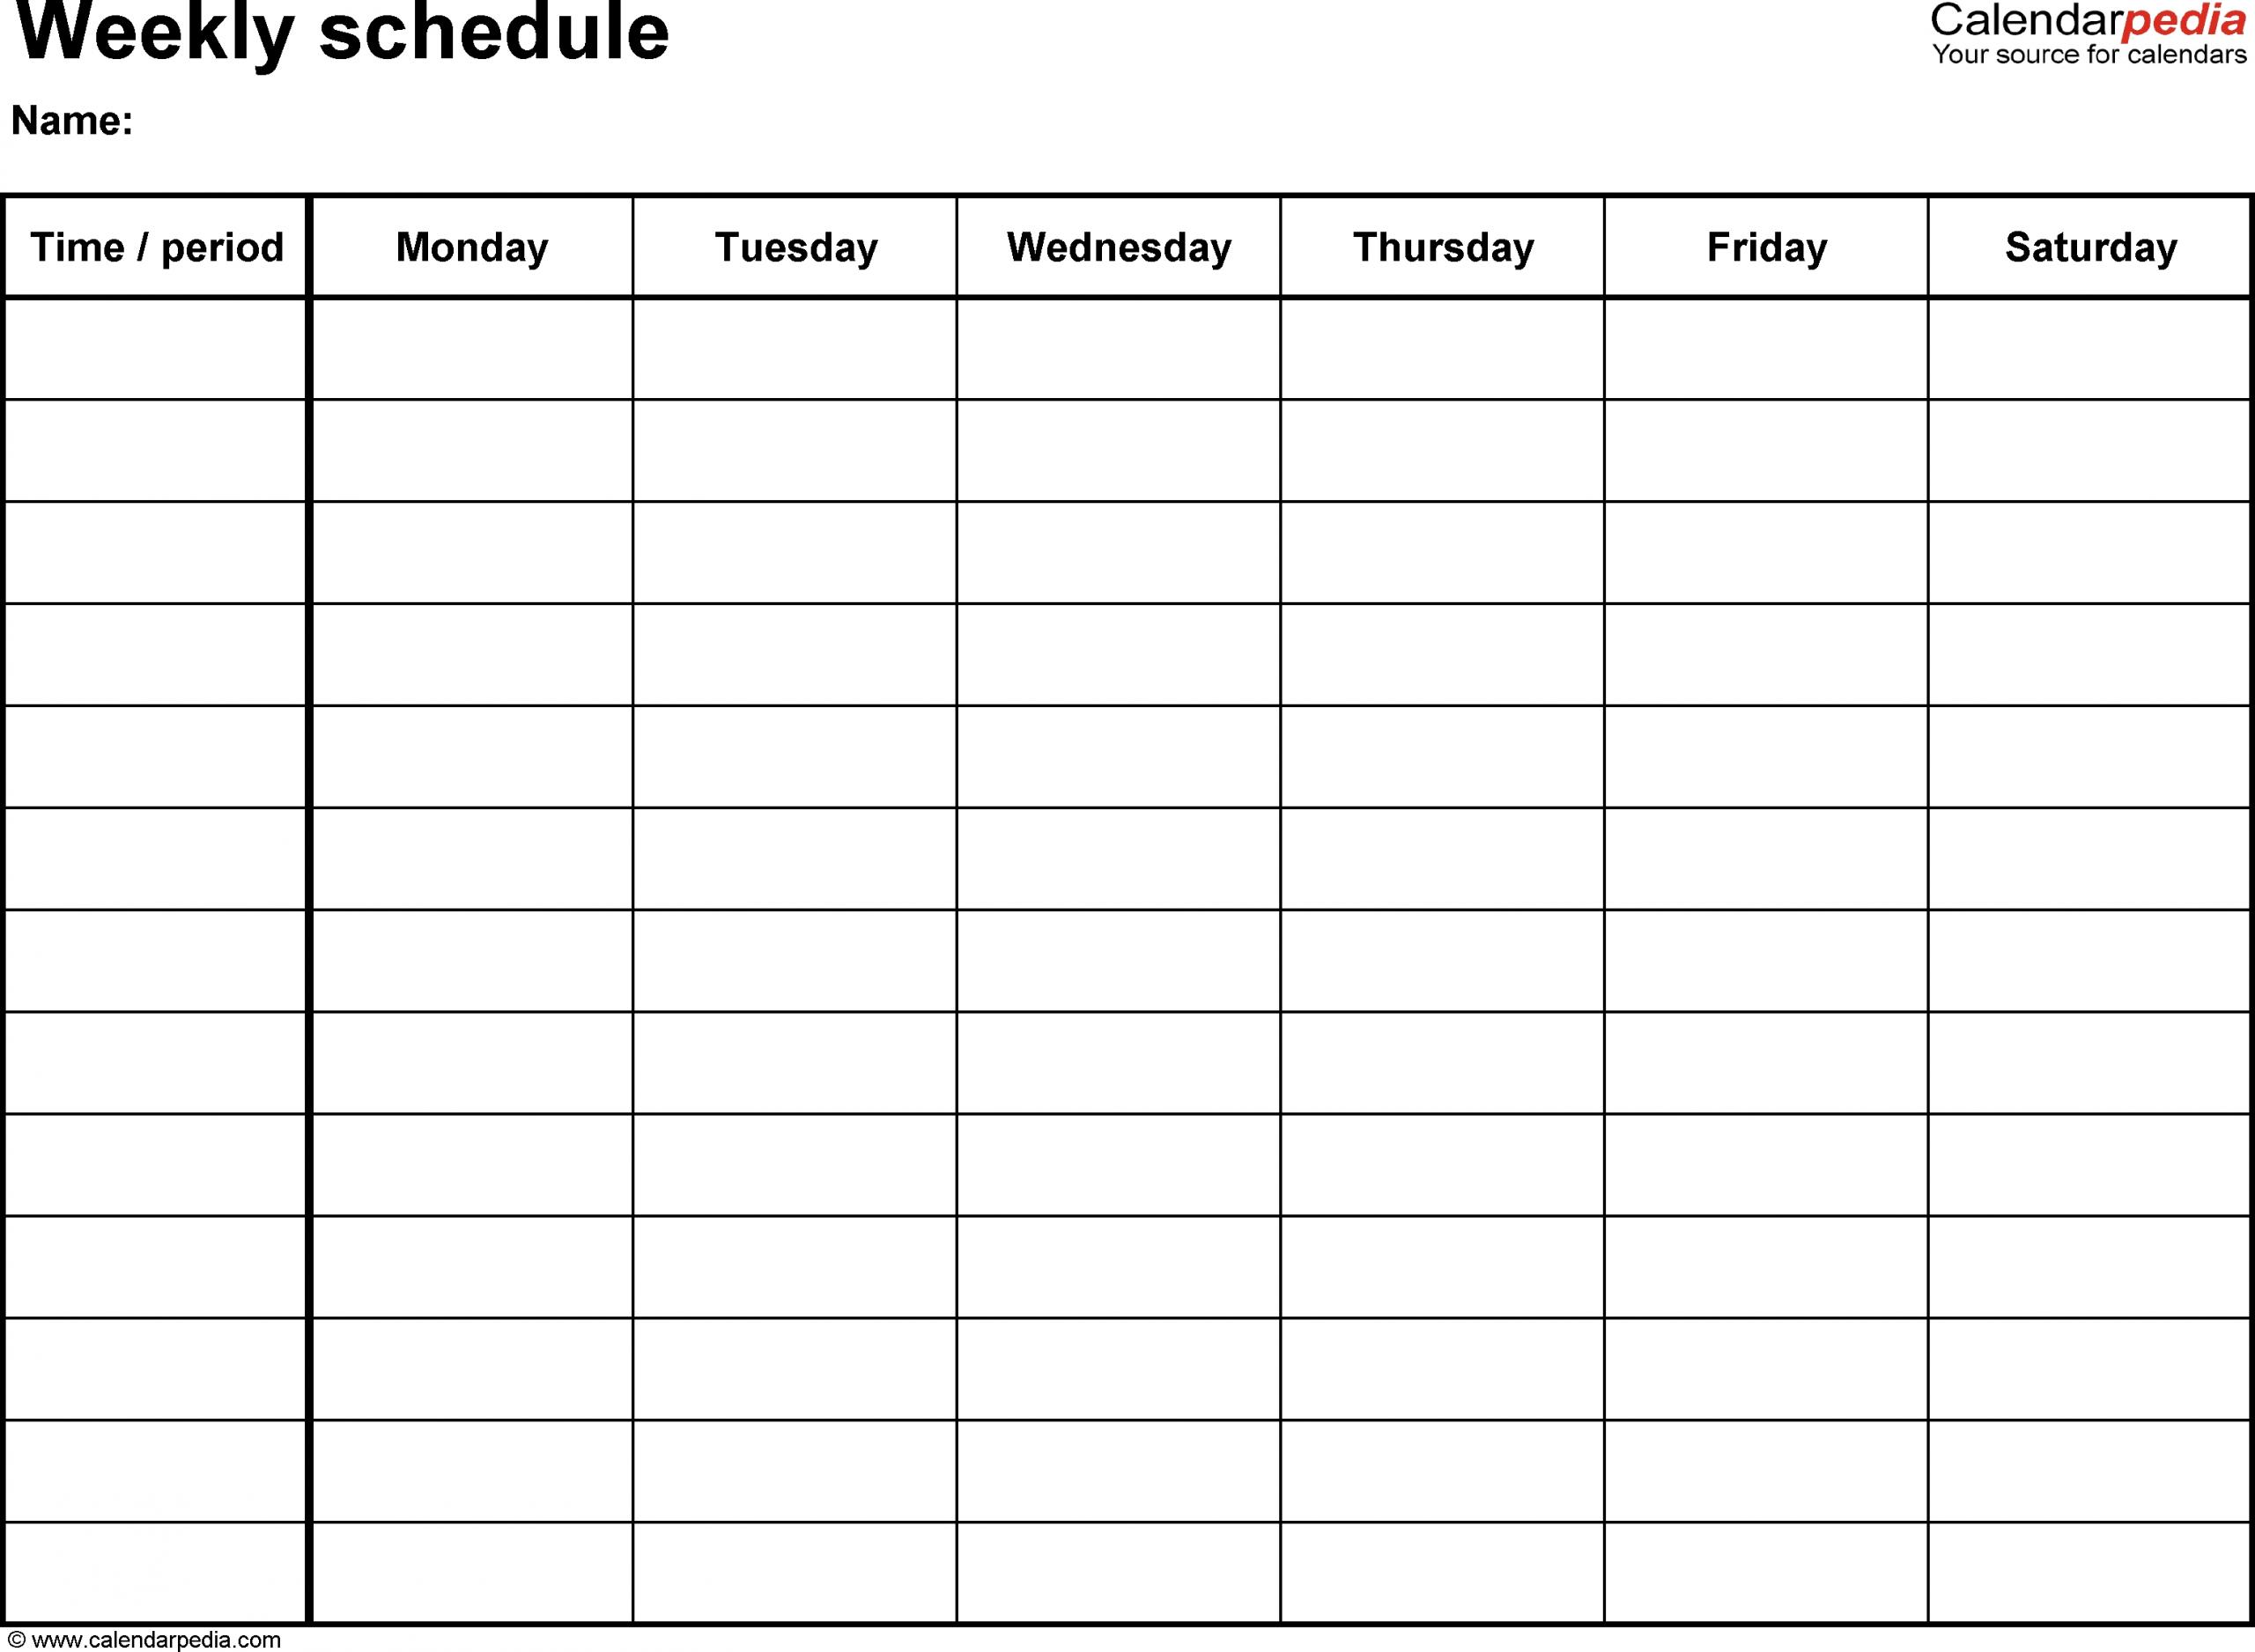 Blank Weekly Calendar To Fill In - Calendar Inspiration Design Online Calendar Fill In